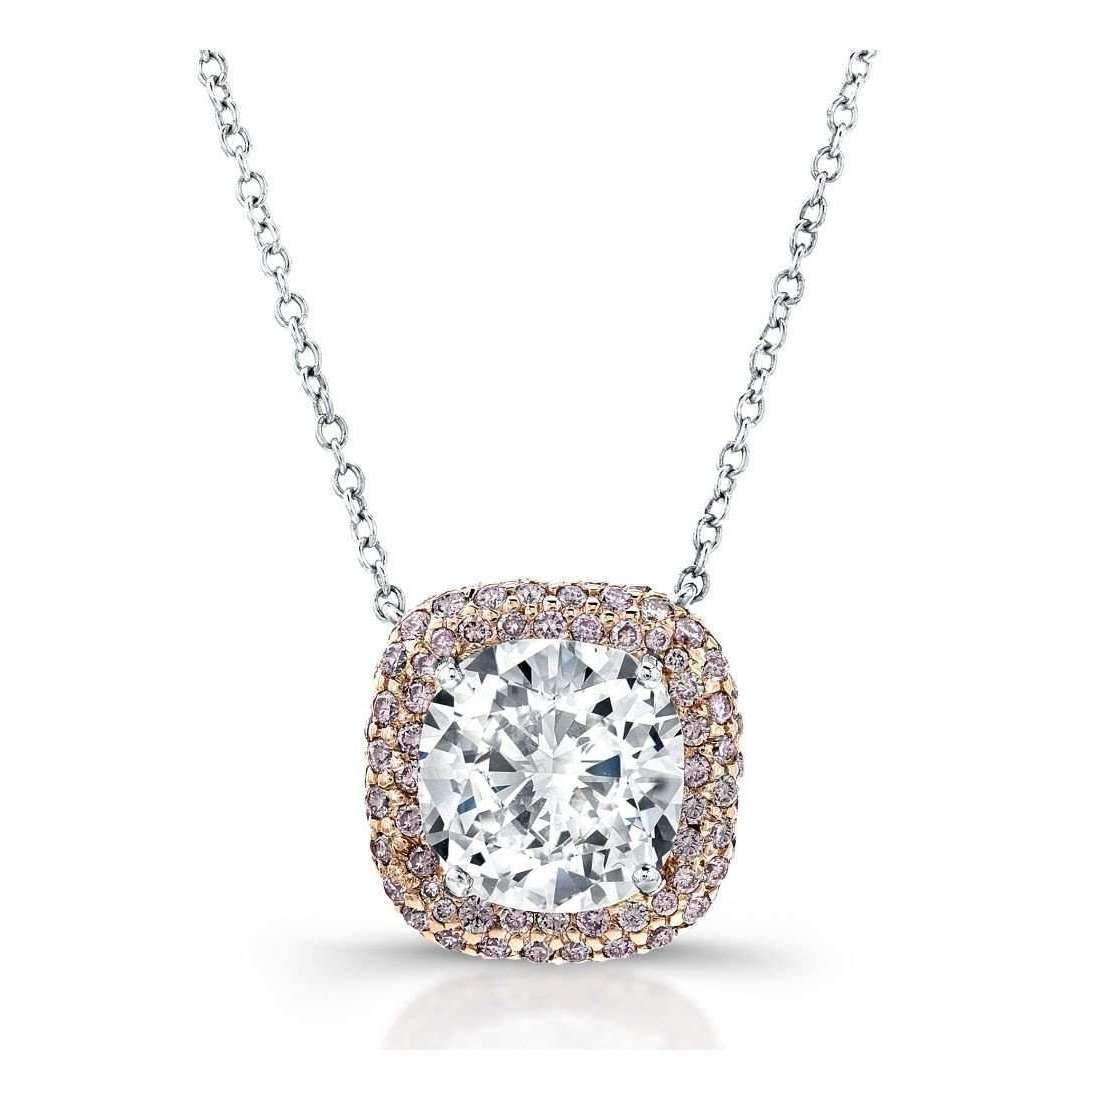 Harry Kotlar Round Diamond Solitaire Bloom Artisan Pave Necklace - 16 jJTWAJ1cCR